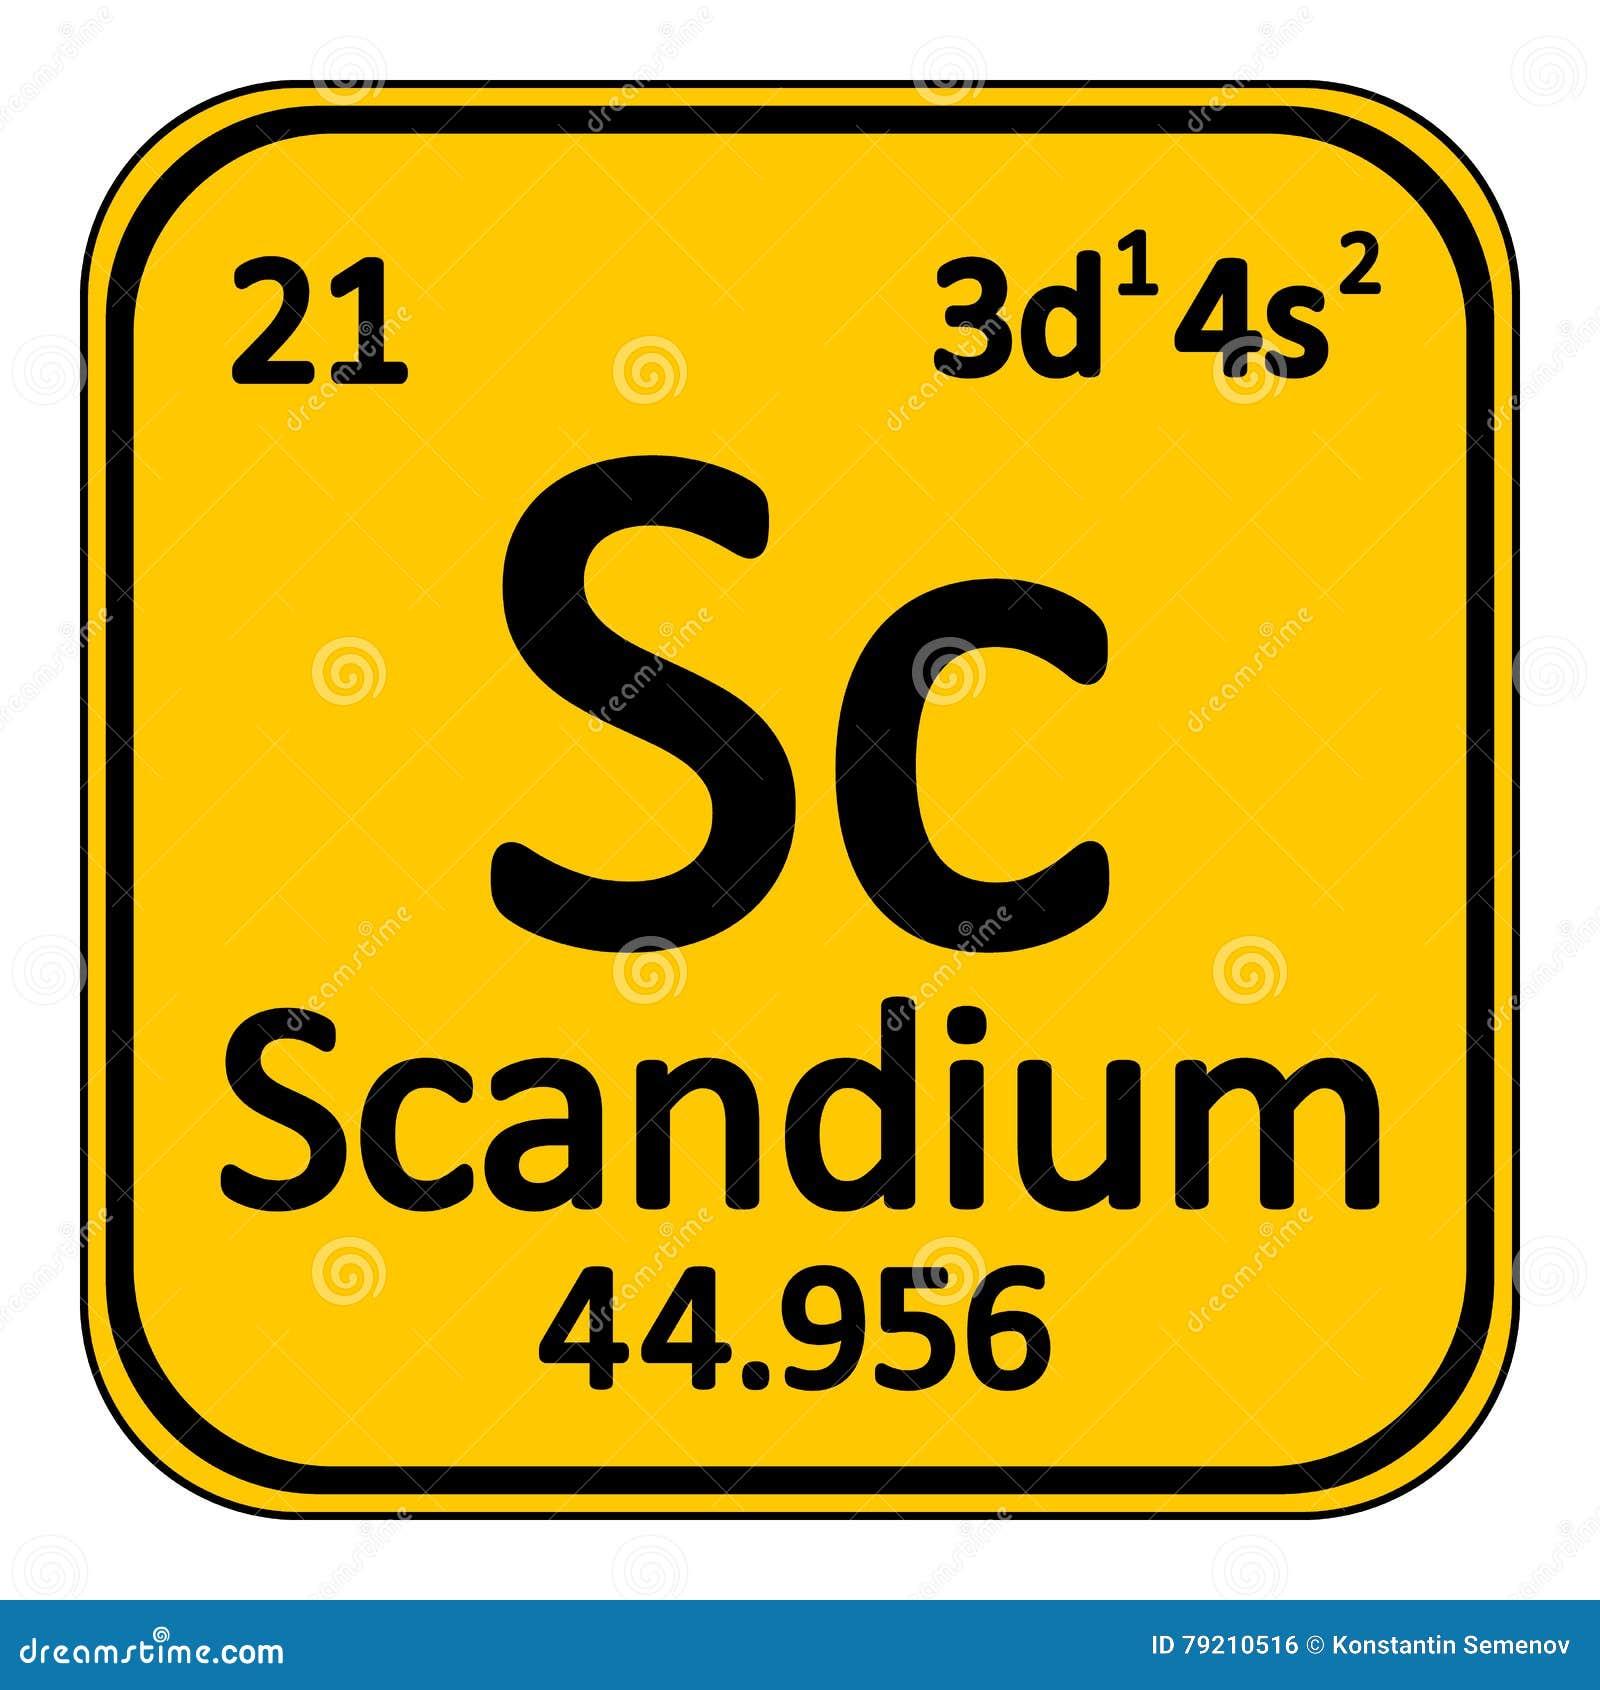 List of synonyms and antonyms of the word scandium symbol amazon periodic table of elements 21 sc scandium symbol mug urtaz Choice Image